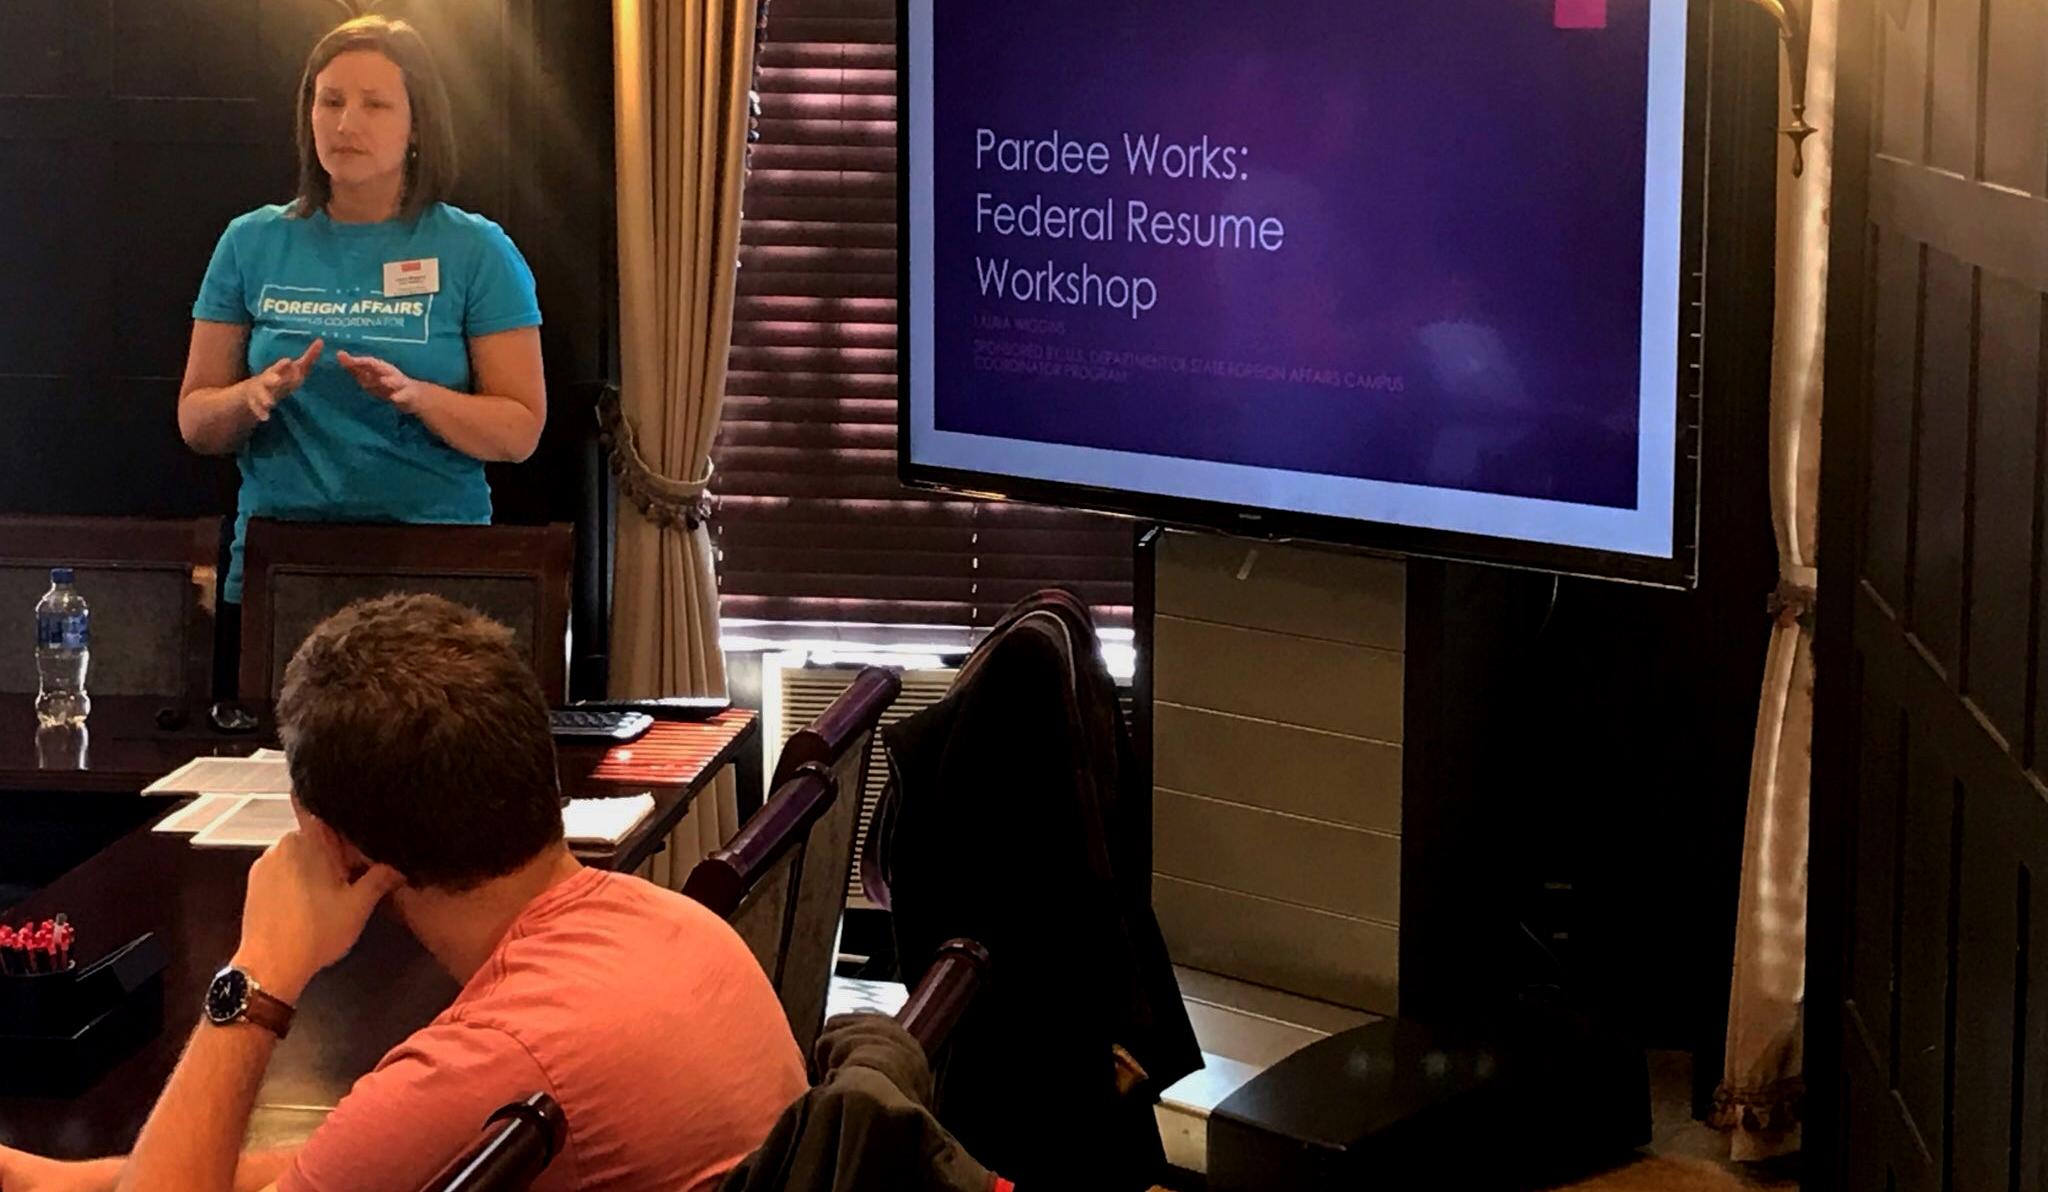 Pardee Works: Federal Resume Workshop | The Frederick S  Pardee